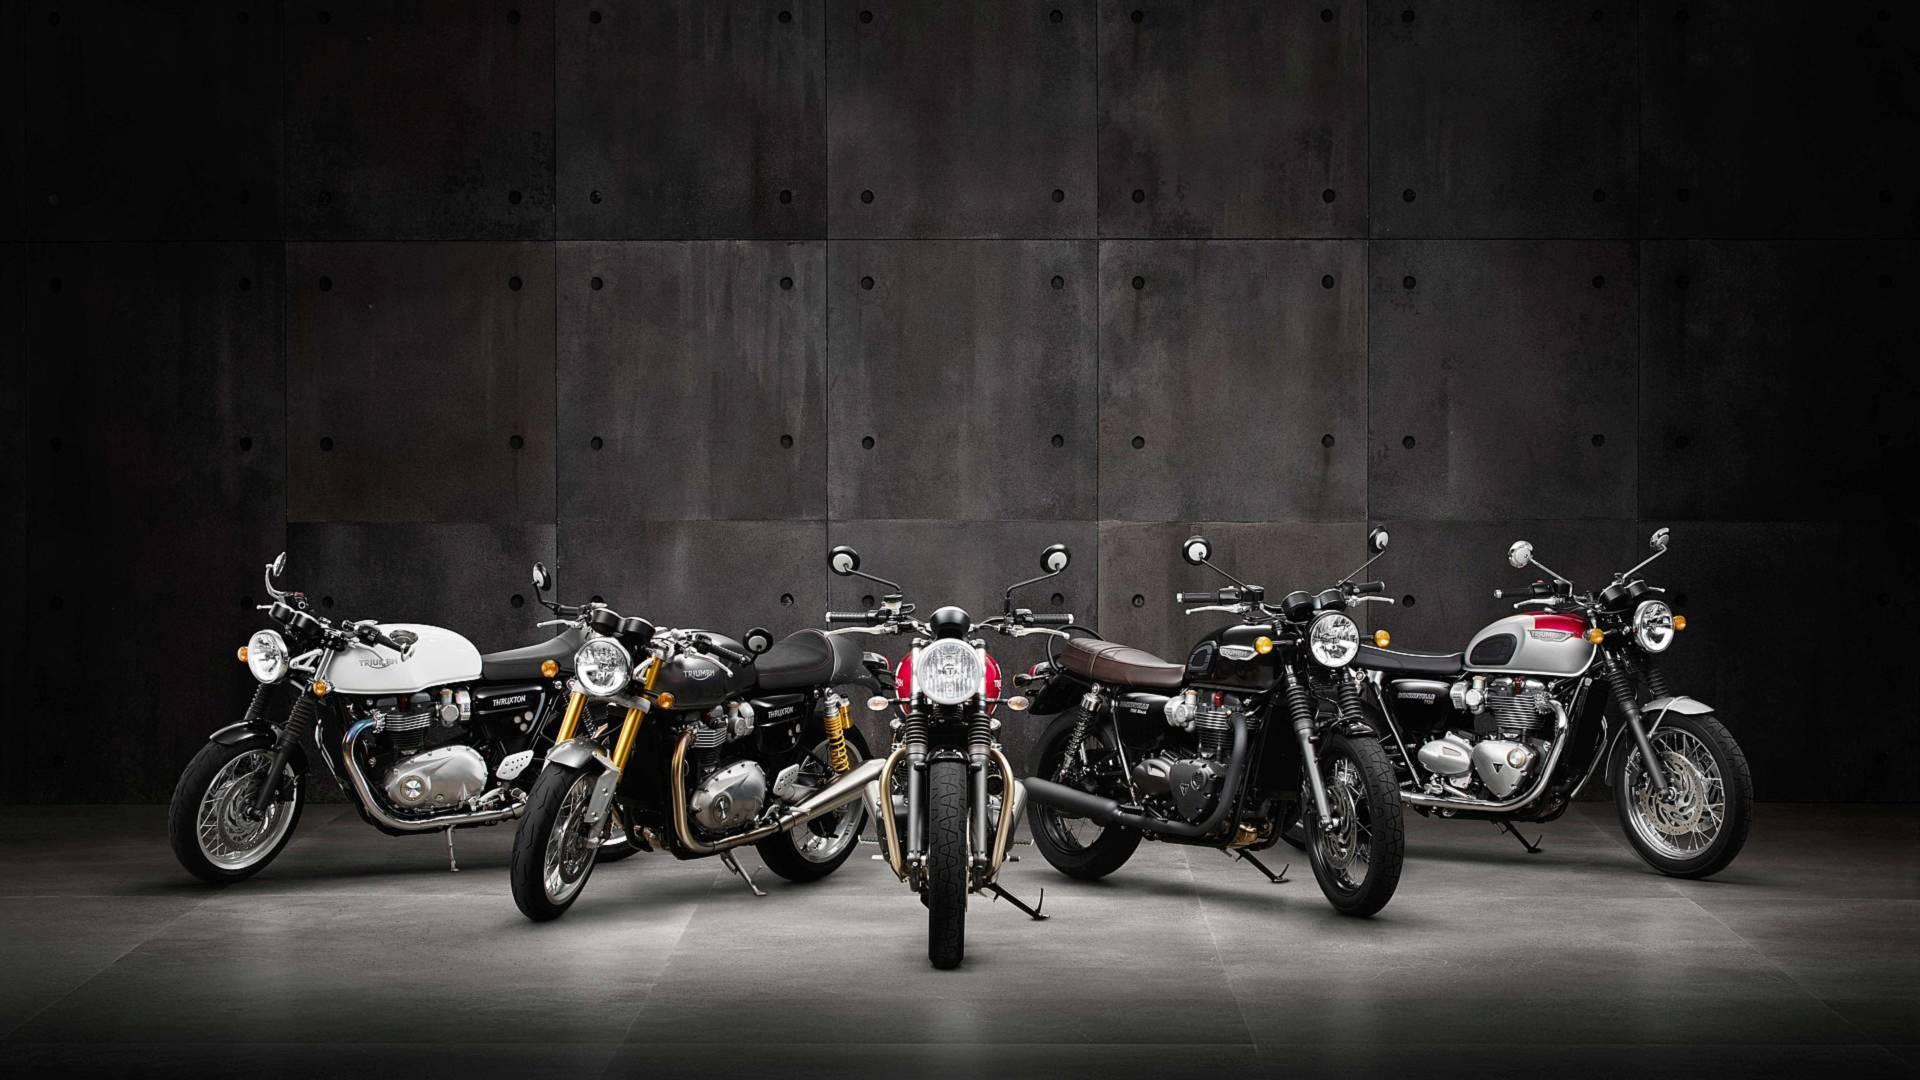 Triumph Announces Pricing For 2016 Street Twin And T120 Bonnevilles